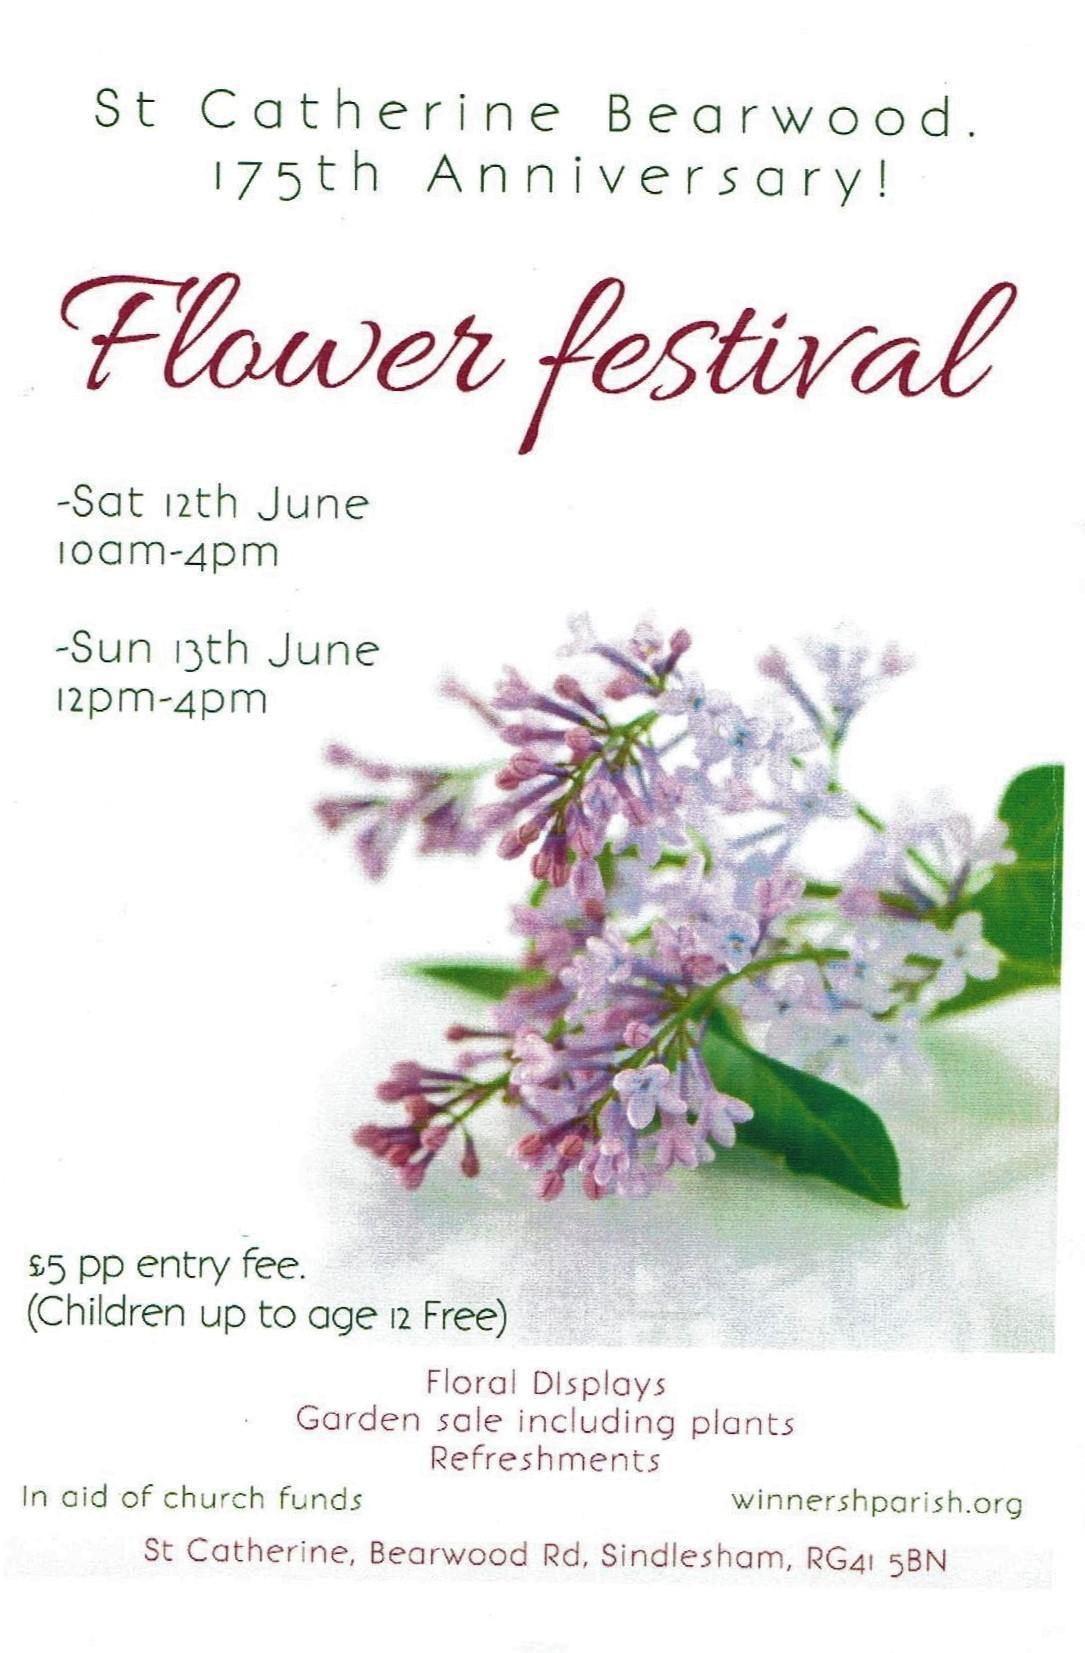 Flower Festival at St Catherine's Bearwood